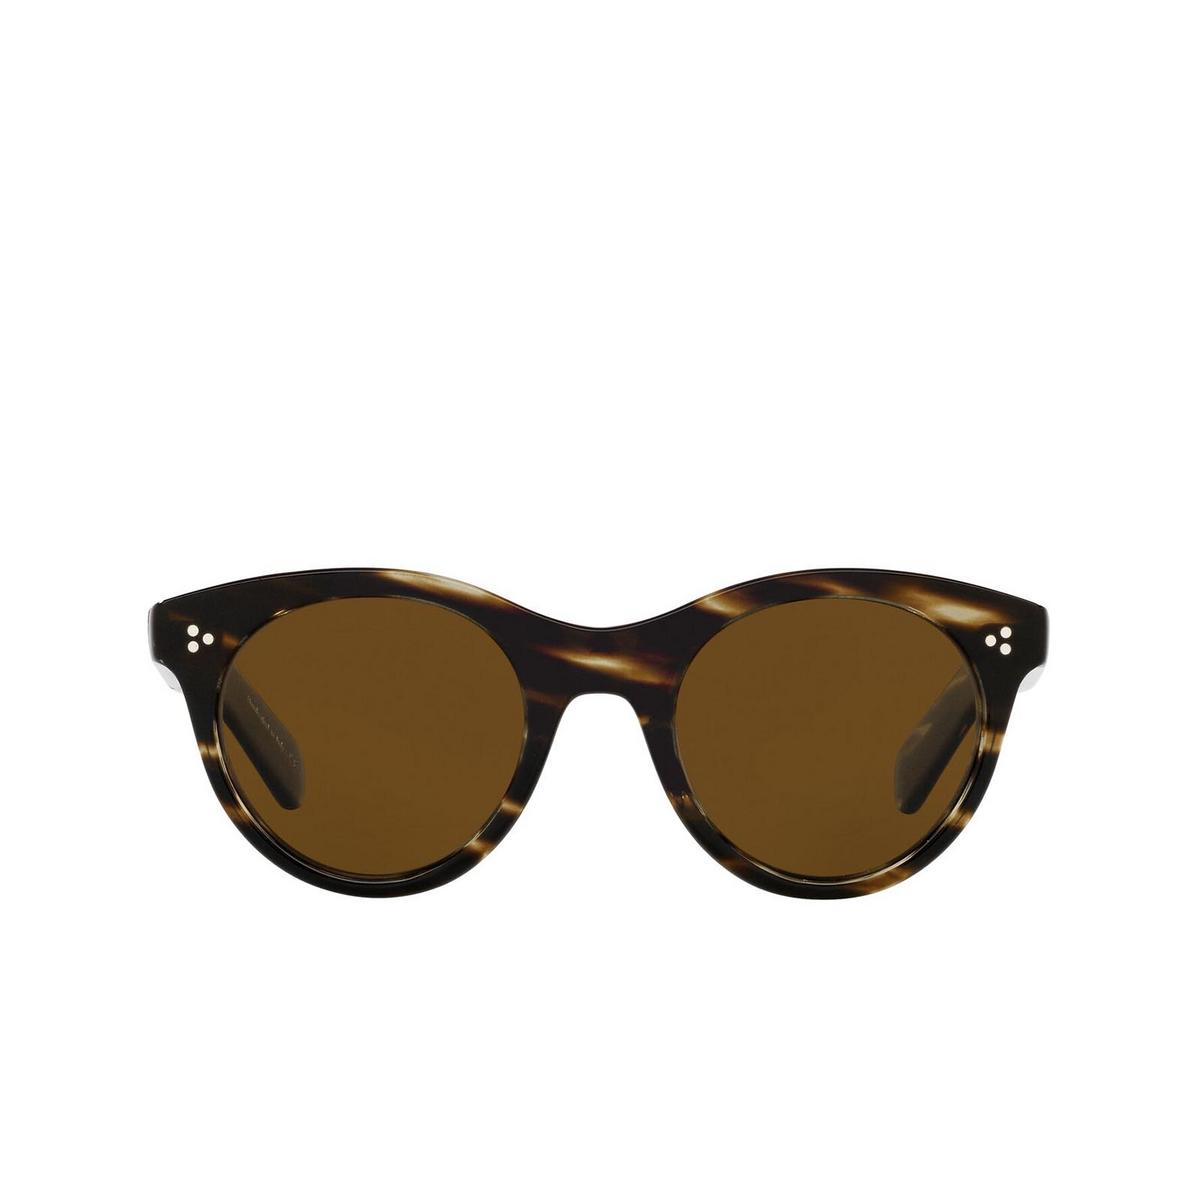 Oliver Peoples® Round Sunglasses: Merrivale OV5451SU color Cocobolo 100357 - front view.